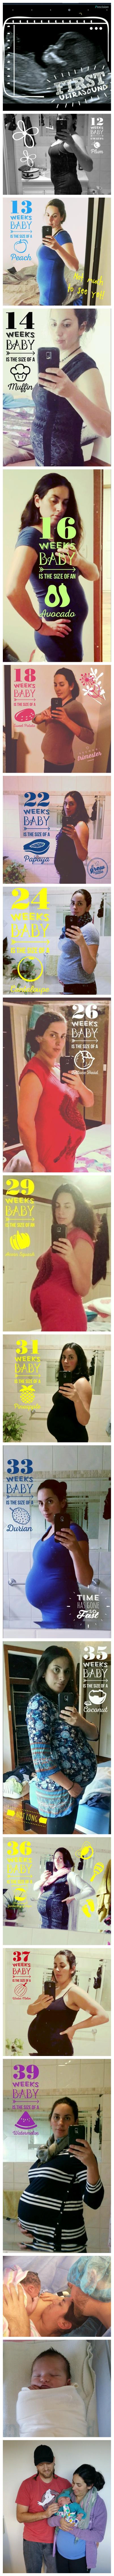 Pregnancytobirth